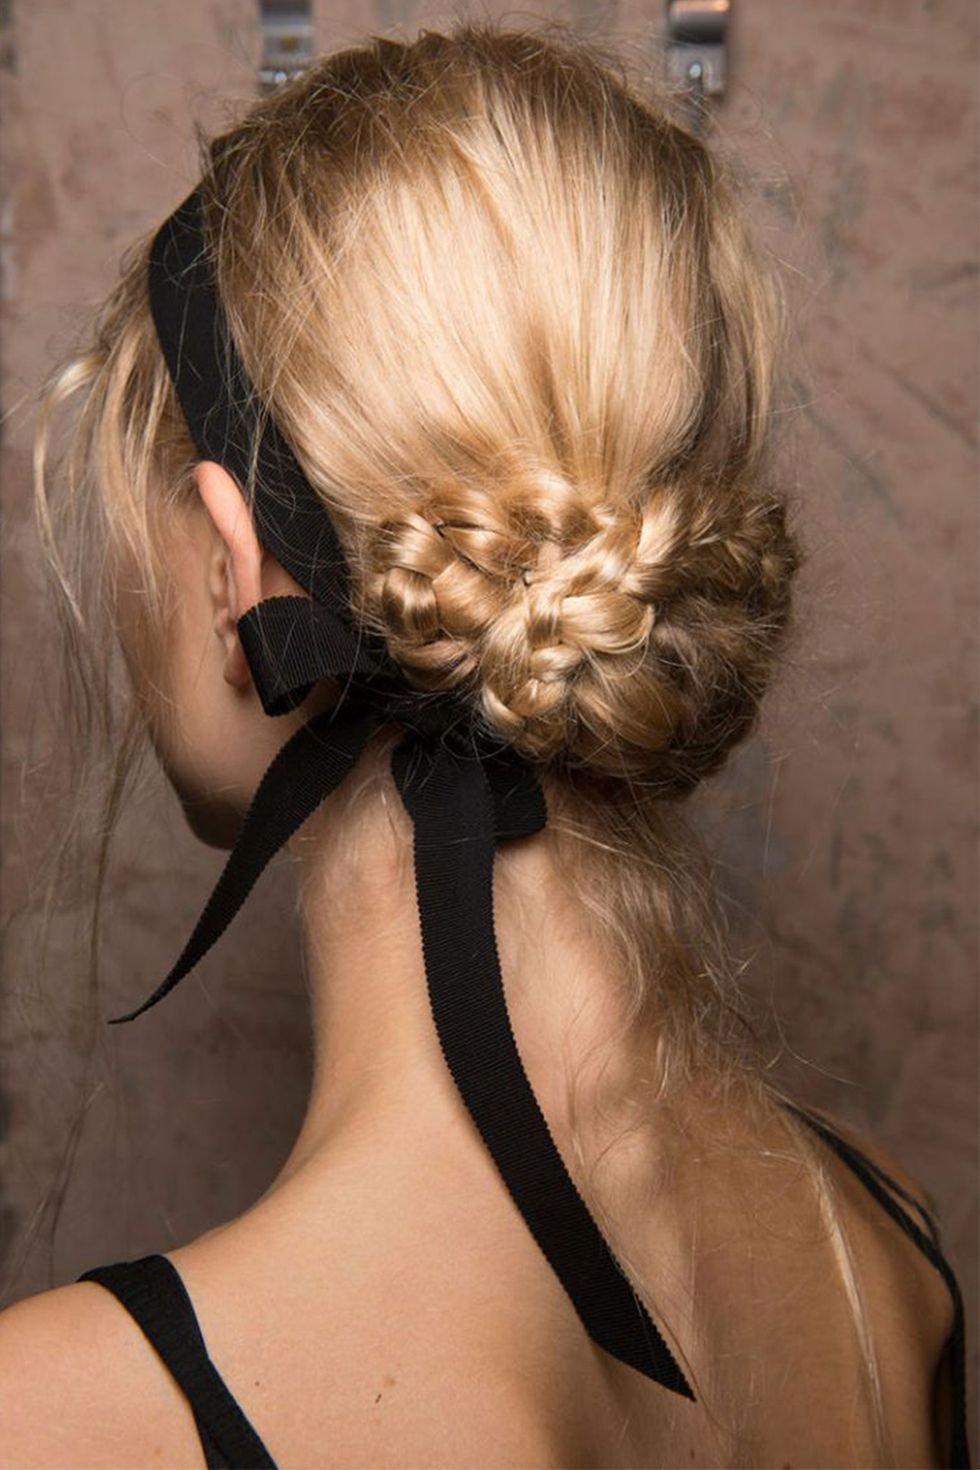 Hair Bow Ideas - Black Ribbon In Hair Inspiration